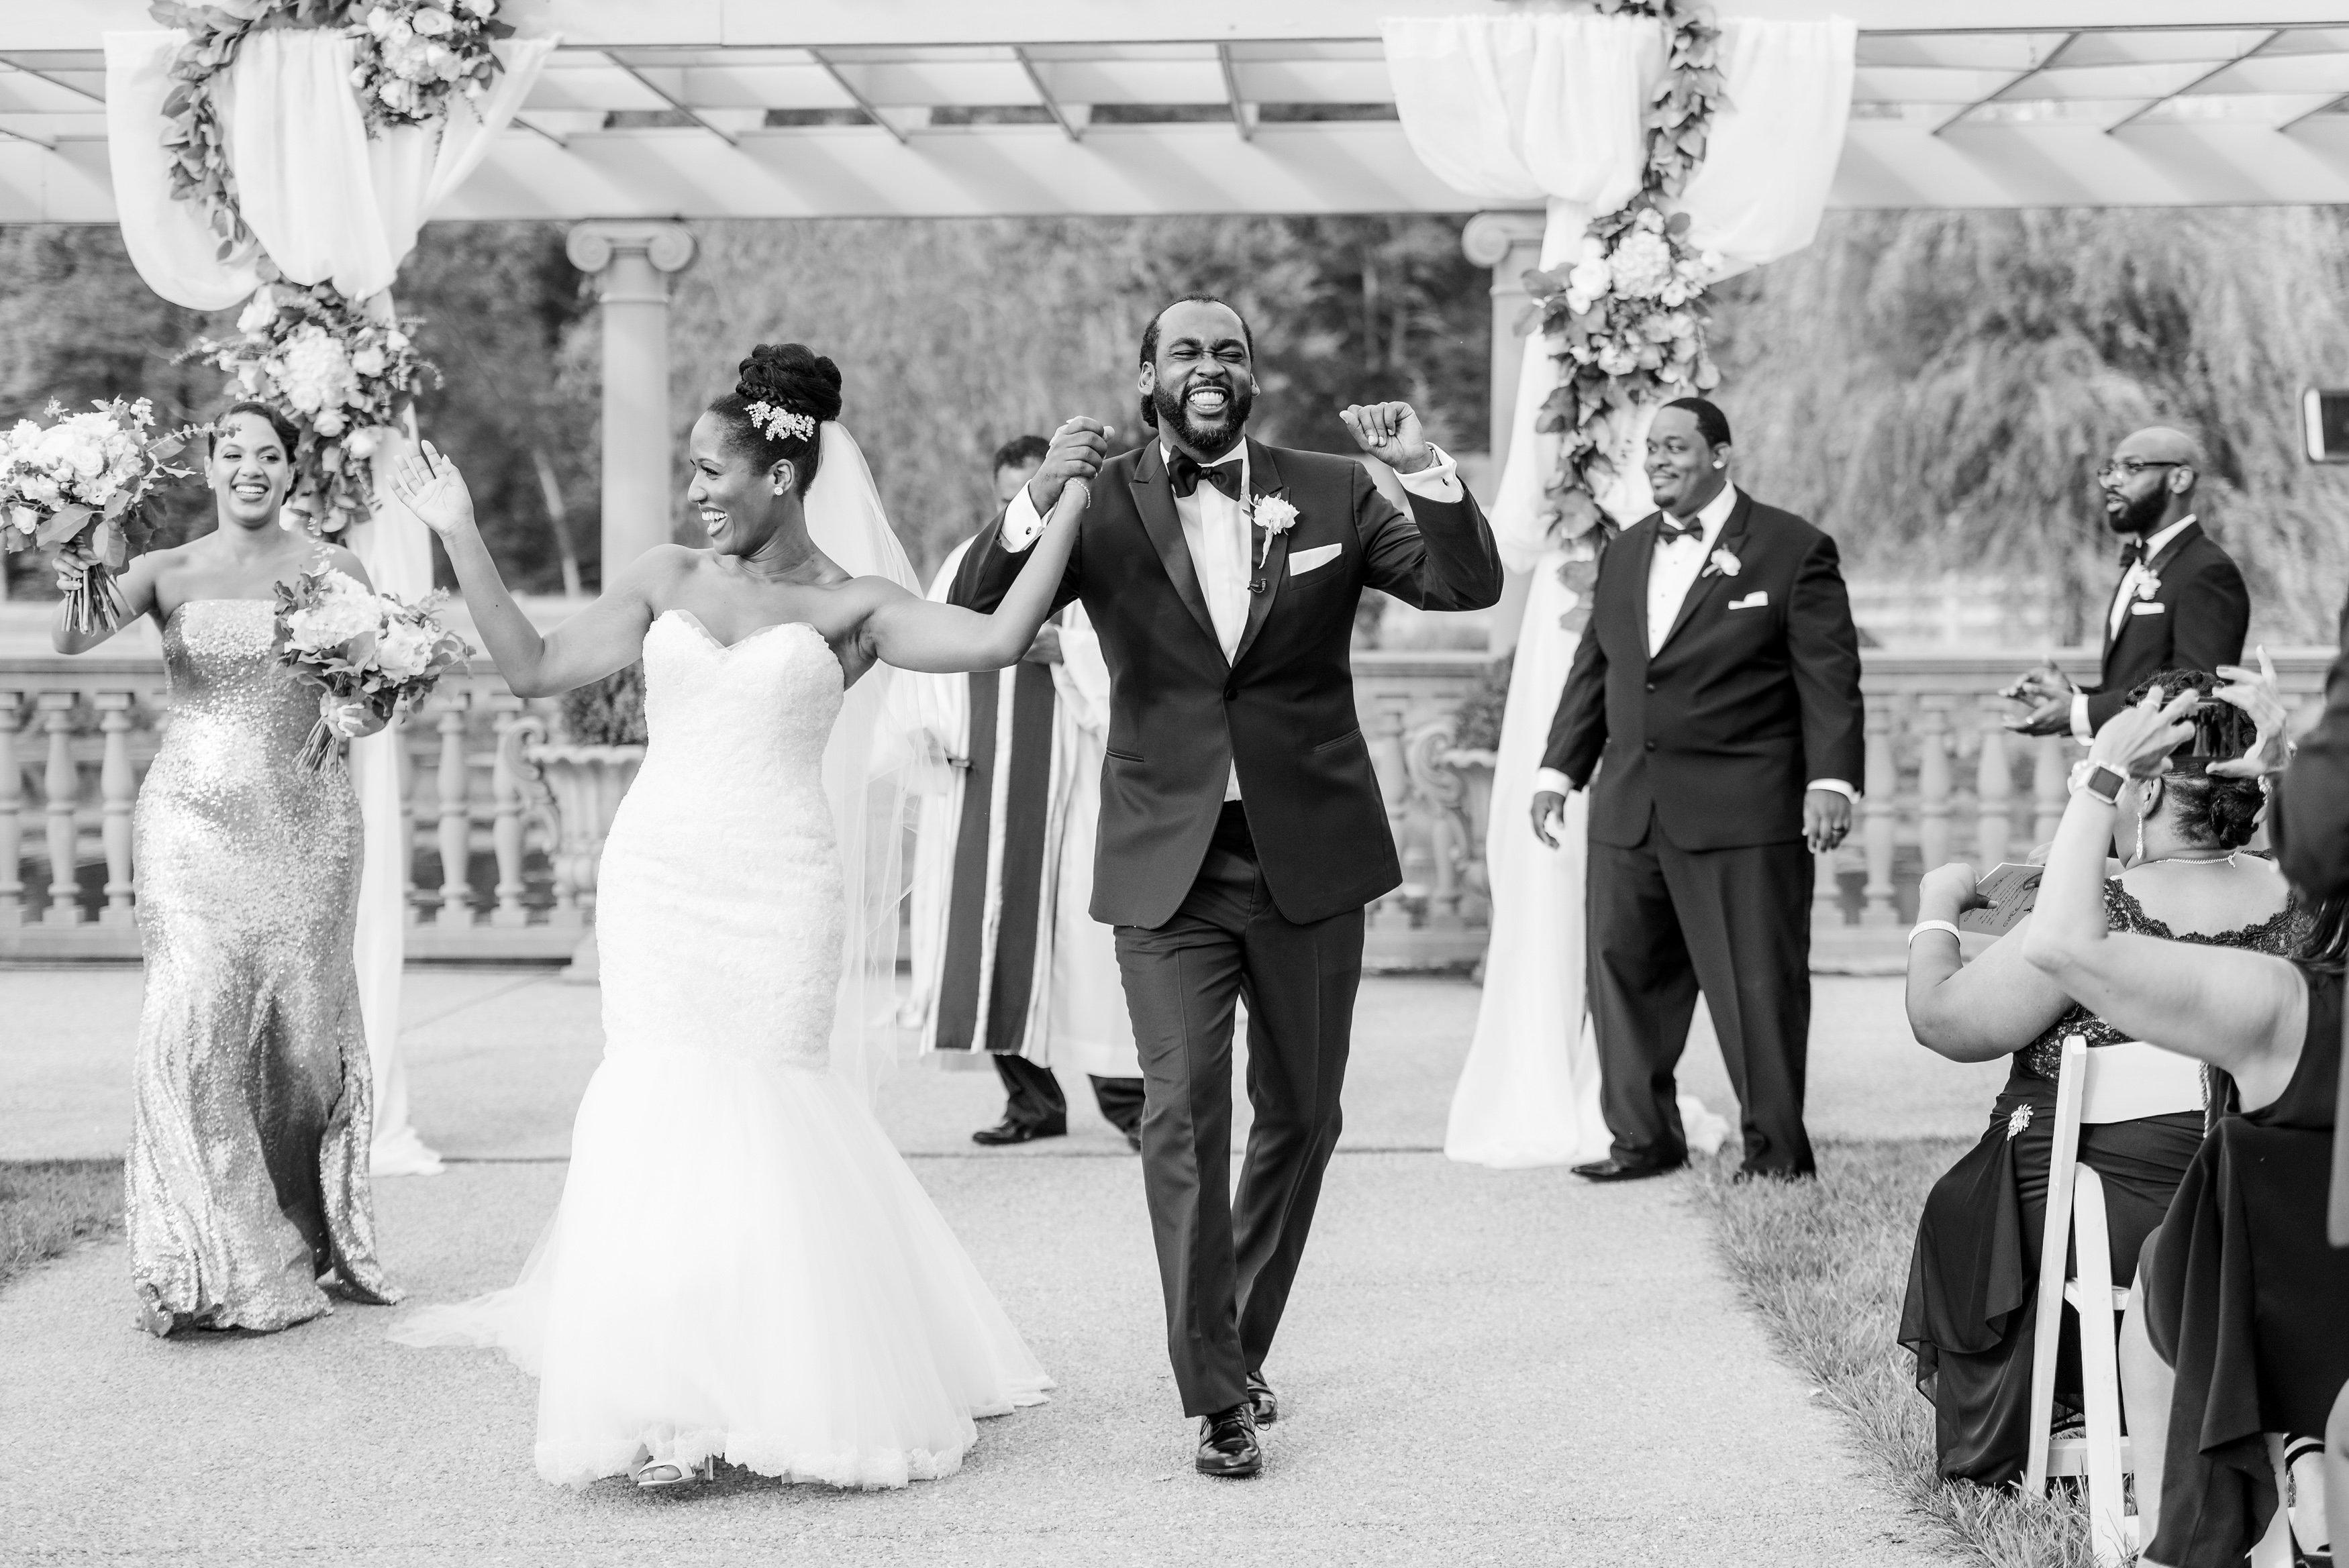 kenisha wendall wedding couple ceremony just married